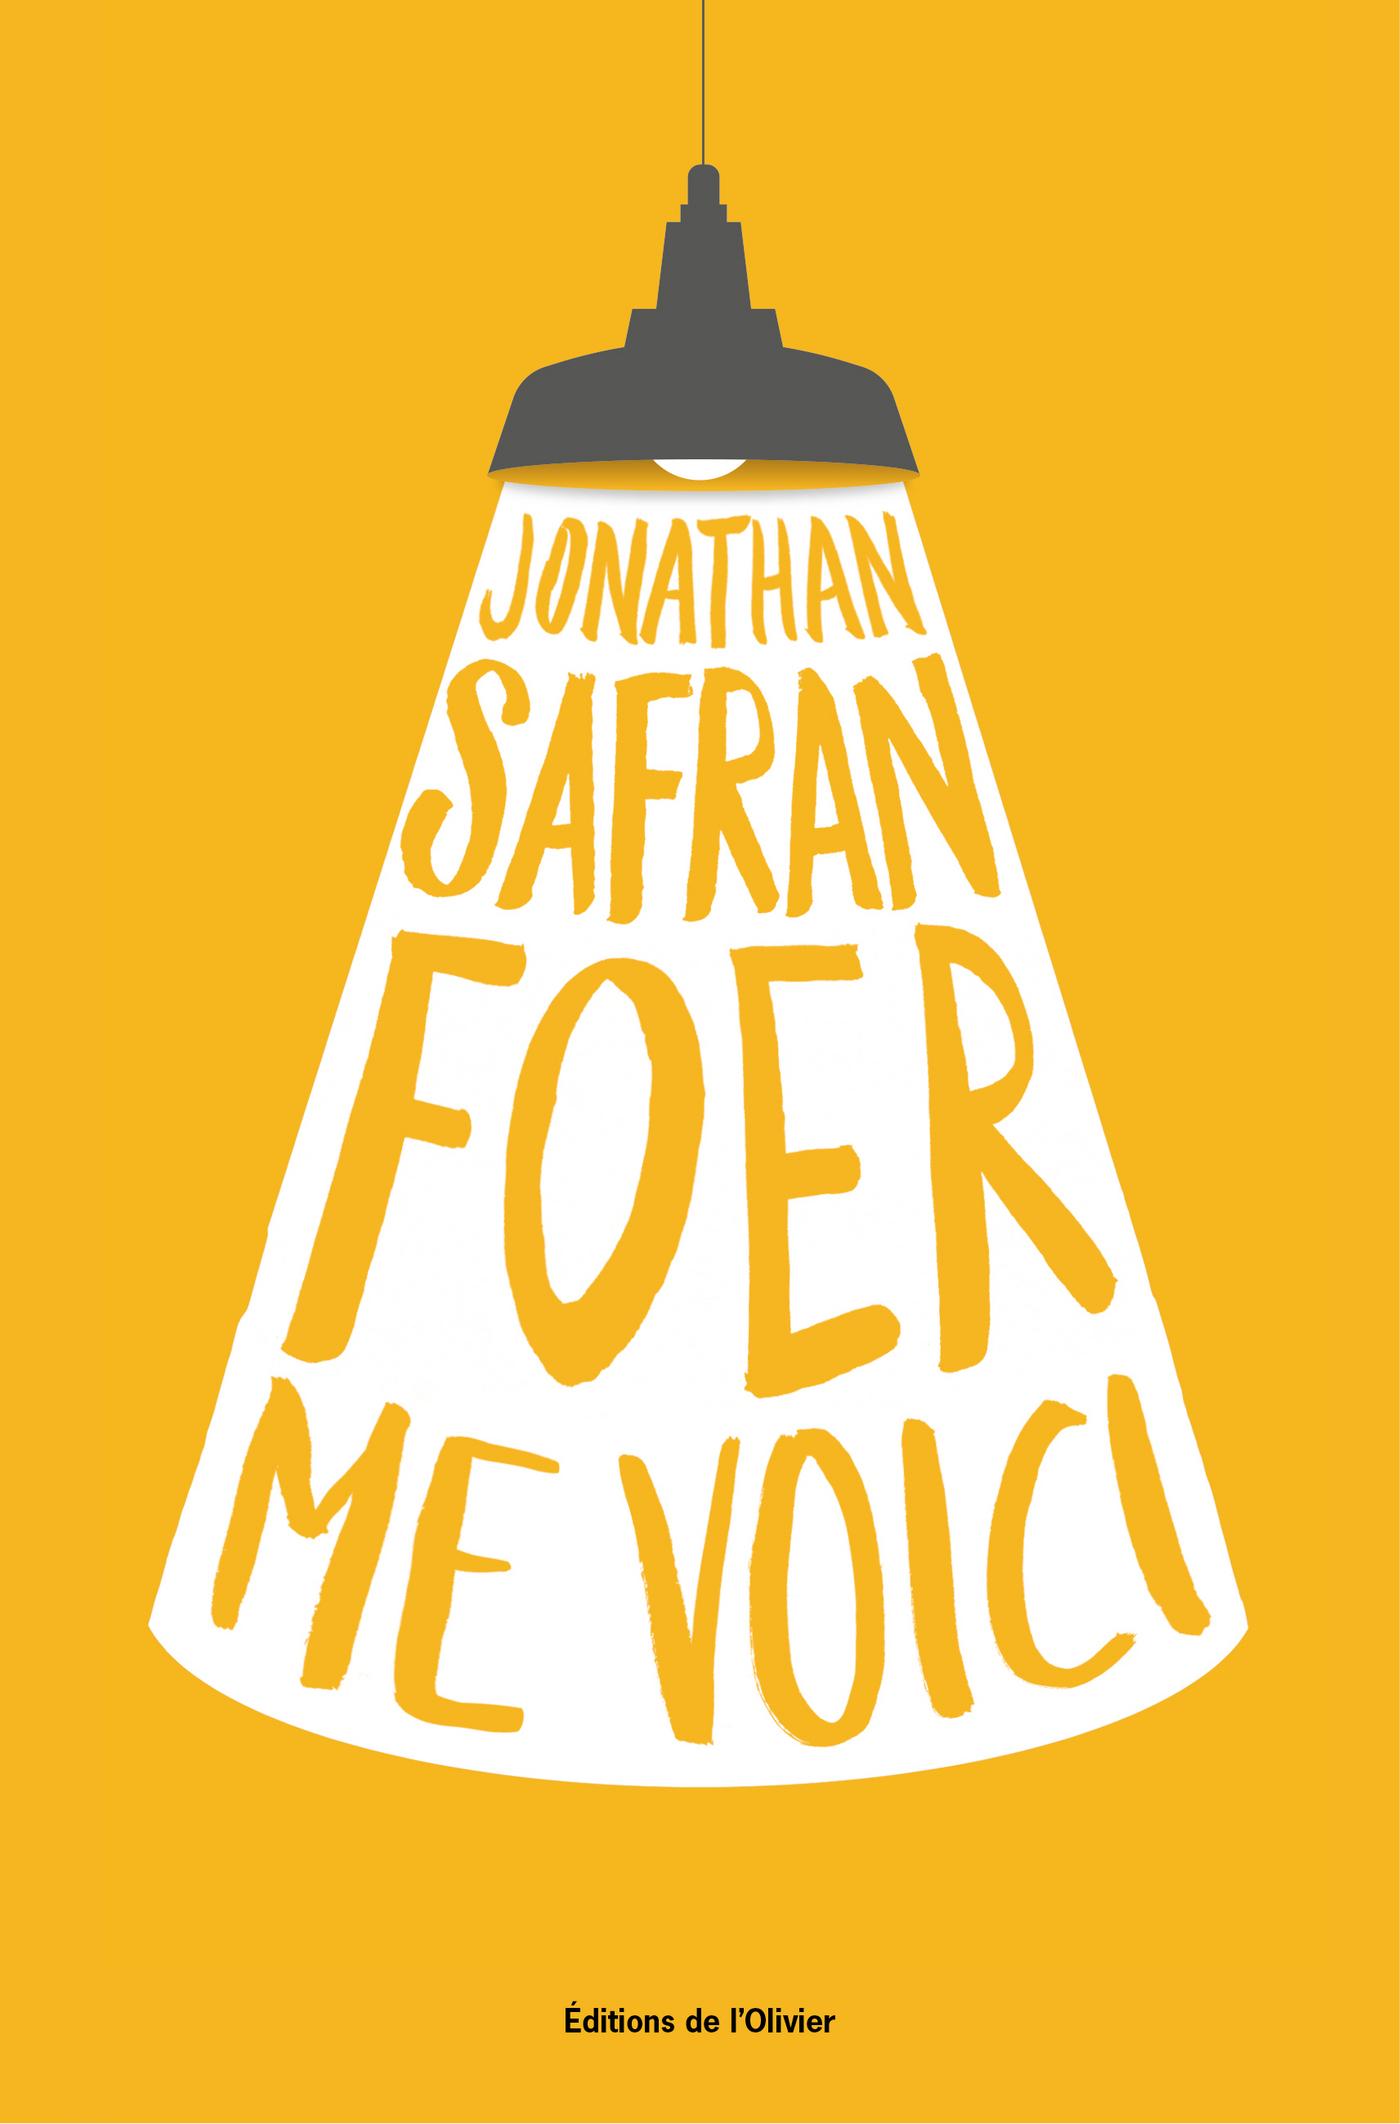 Me Voici | Safran foer, Jonathan